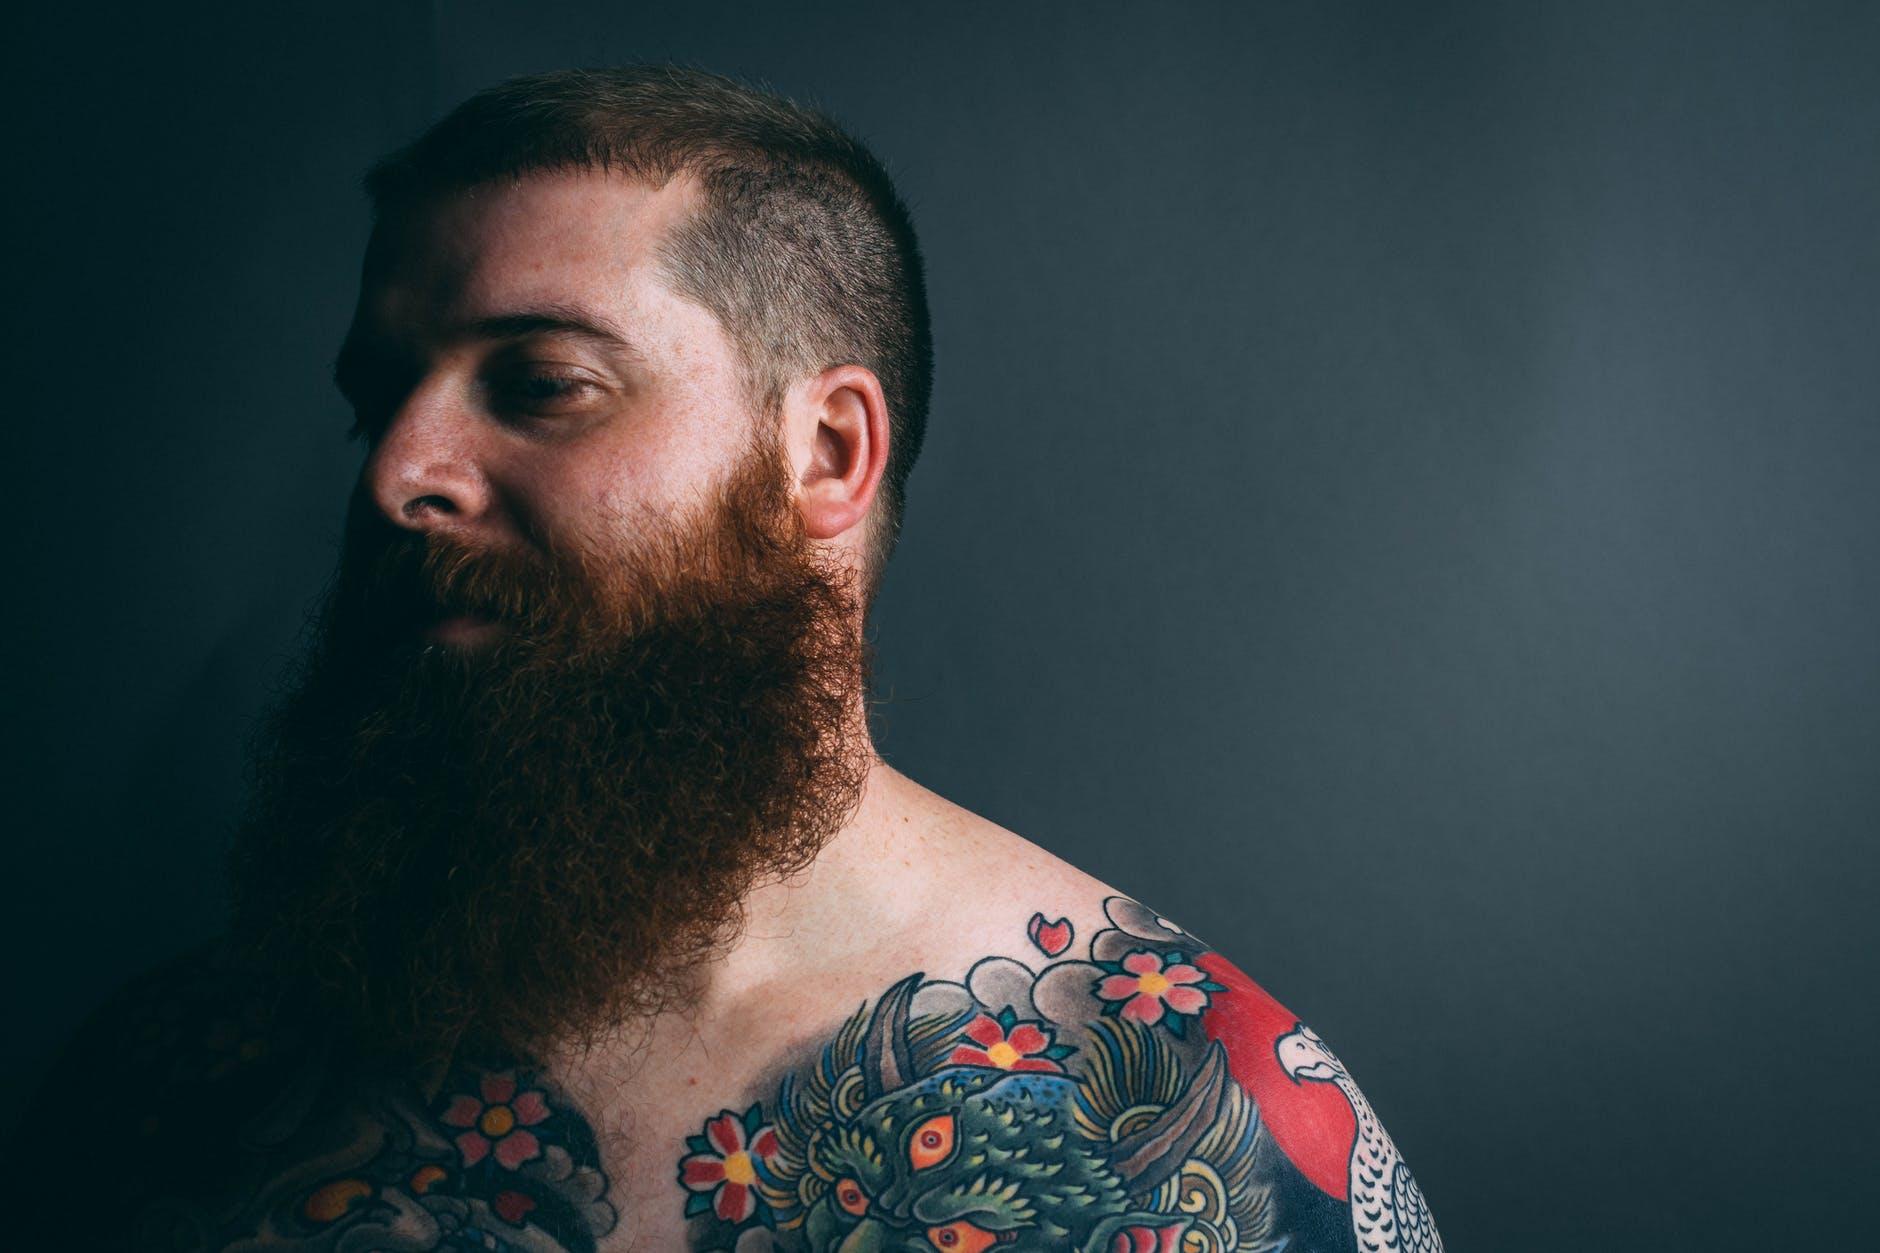 man with body tattoo